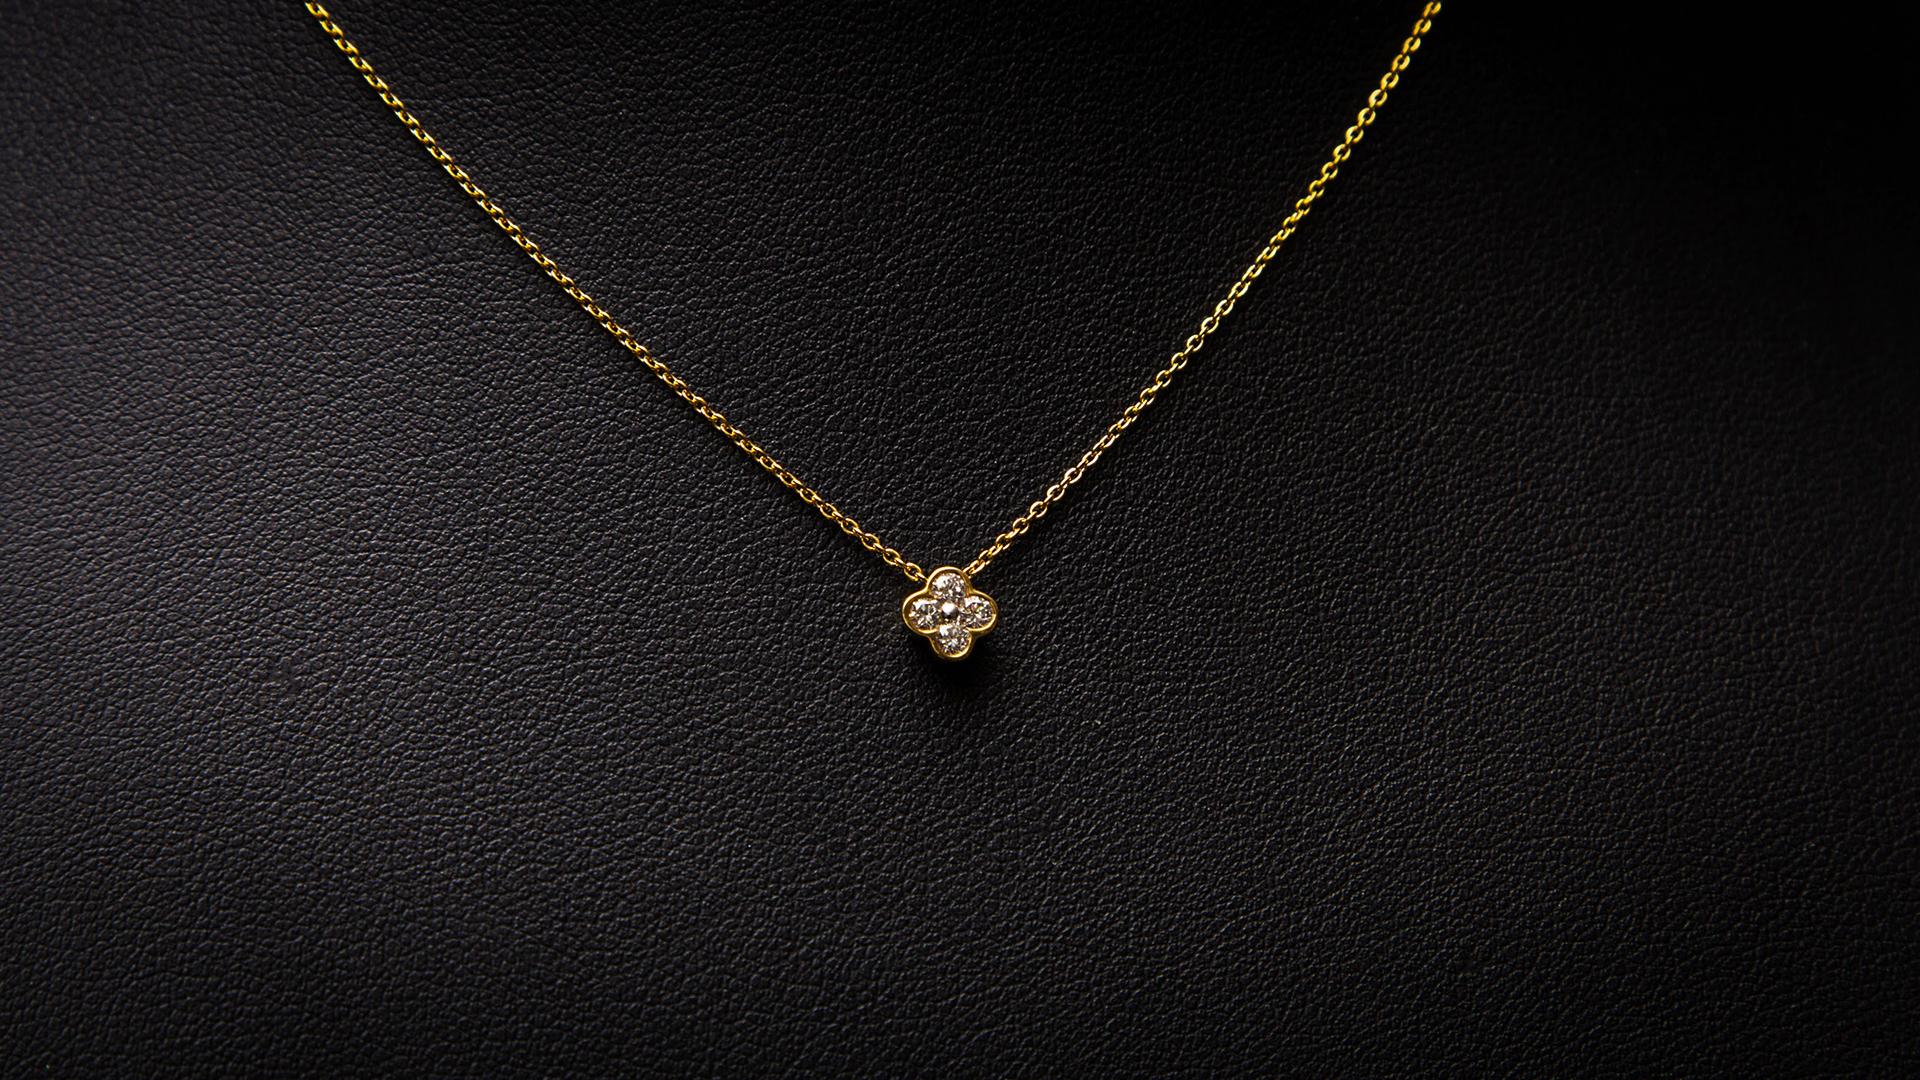 bijouterie-verneau-collier-or-design-fantaisie-diamands-bijoux-bijoutier-toulon-la-garde-var